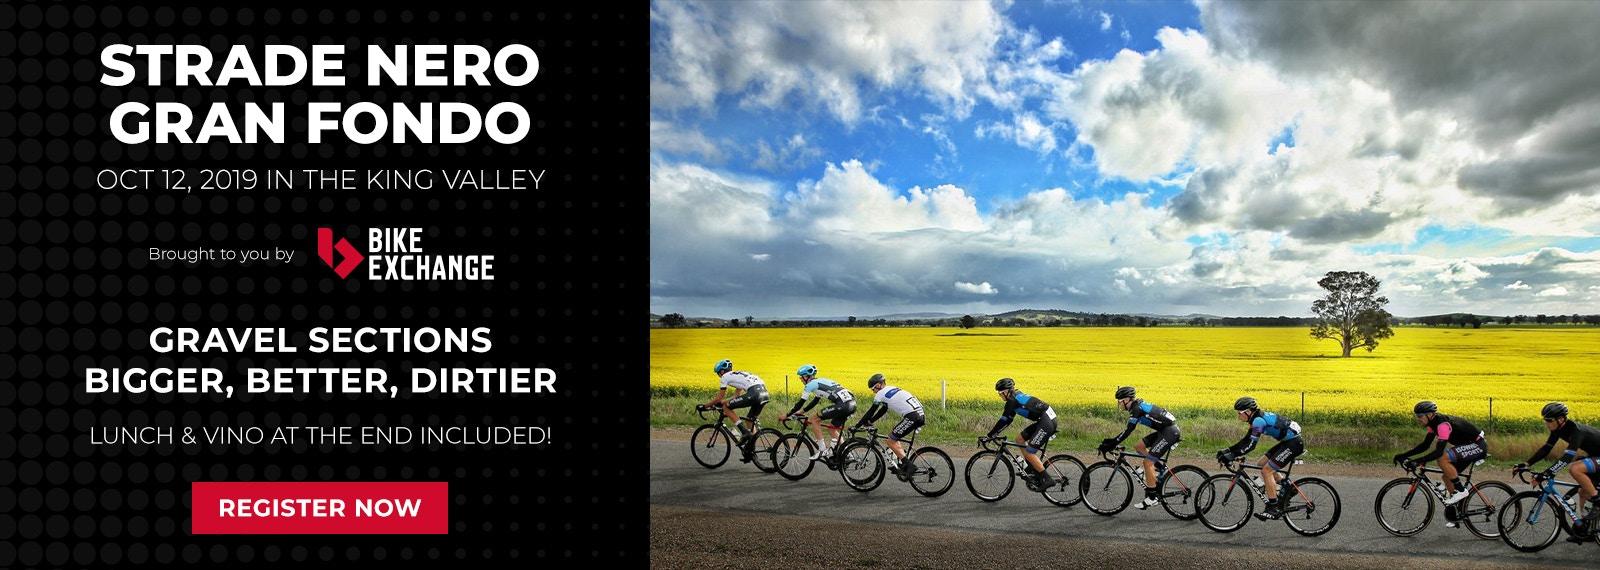 Bikes for Sale | Bike and Cycling Shops - BikeExchange com au